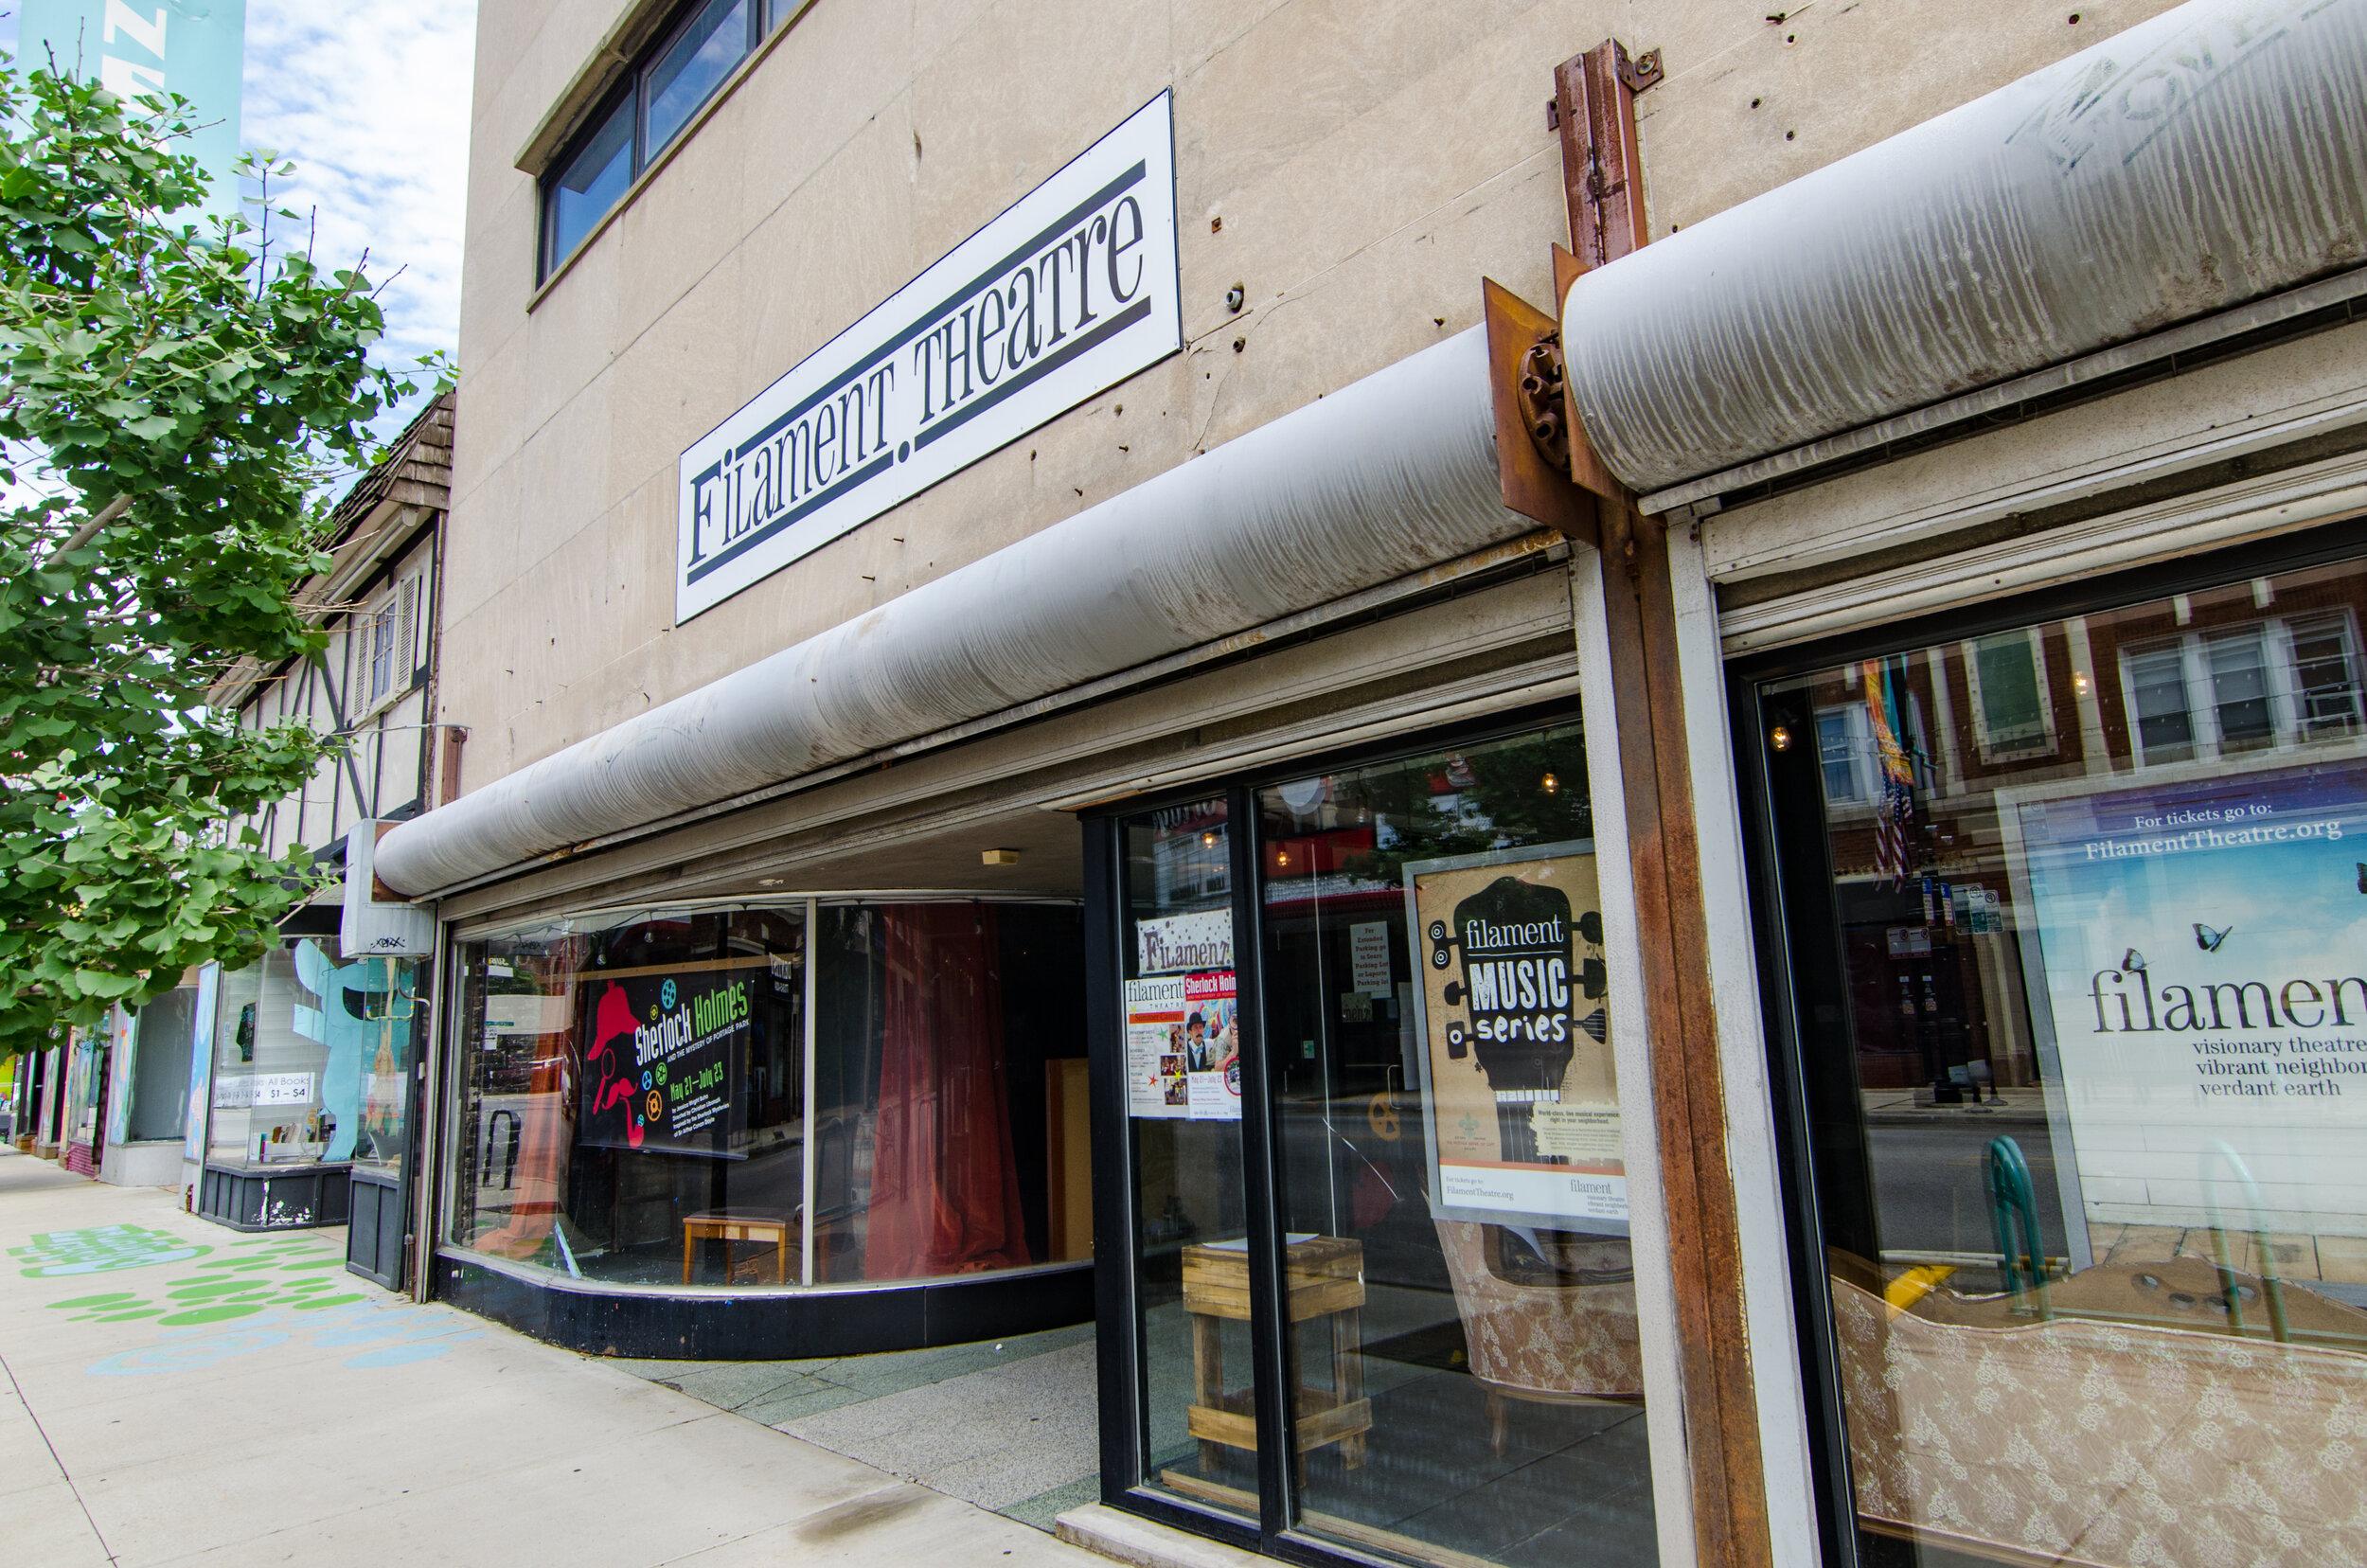 PORTAGE LOFTS ARTS CENTER - 4041 N. Milwaukee Ave.